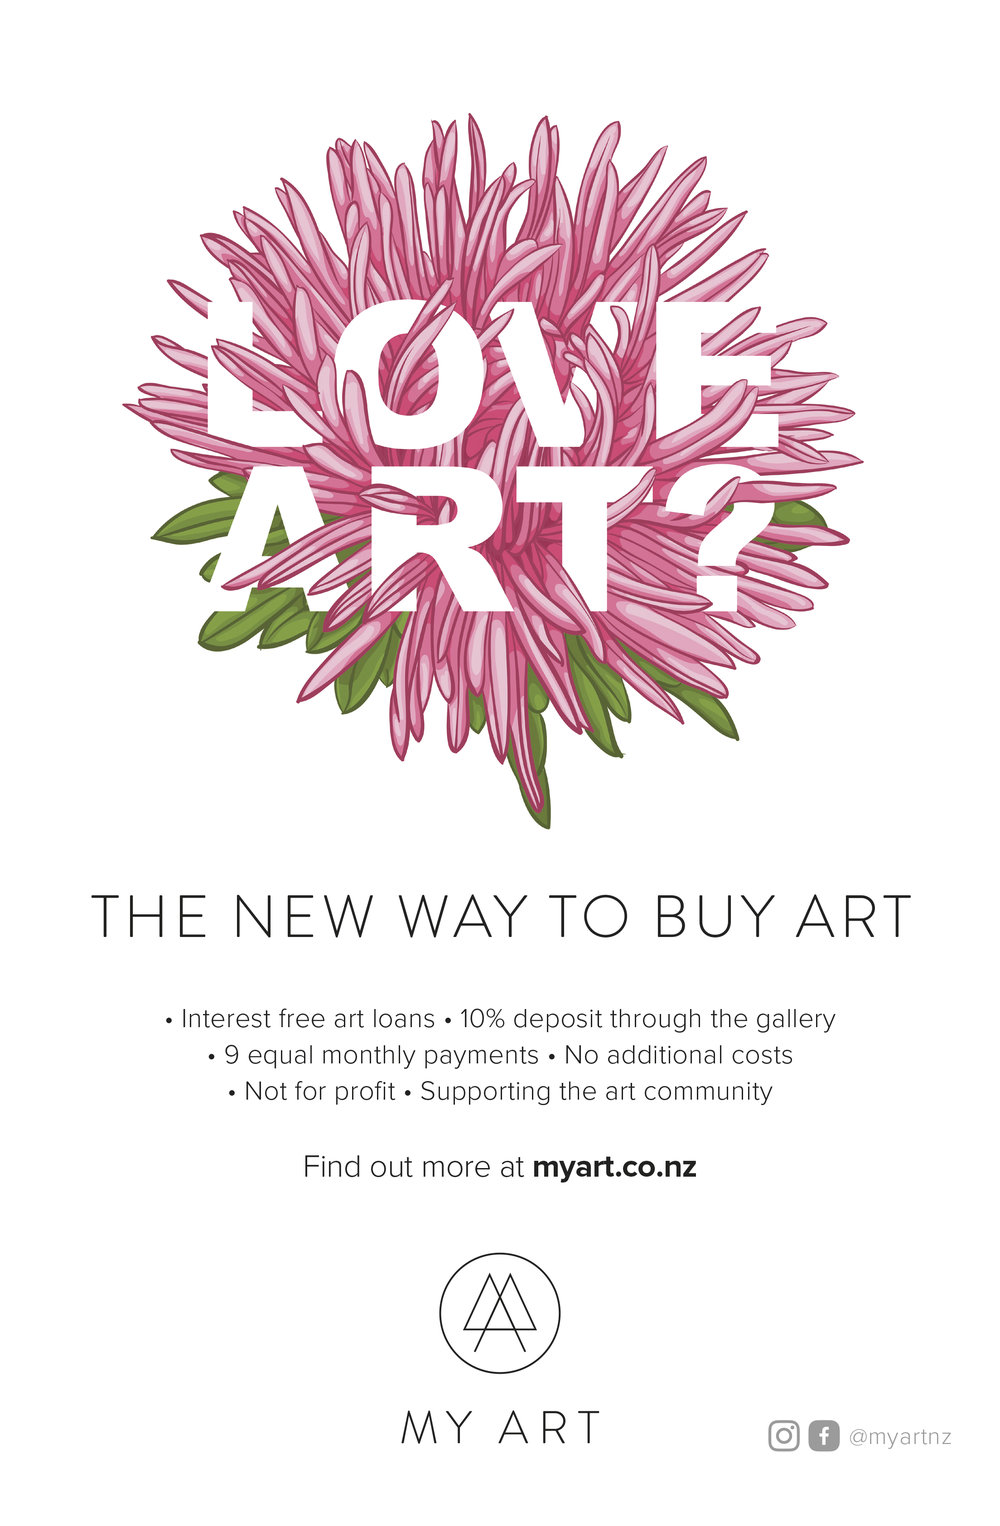 MYART0069-Wairau-Gallery-Ad_285x190_v1.jpg